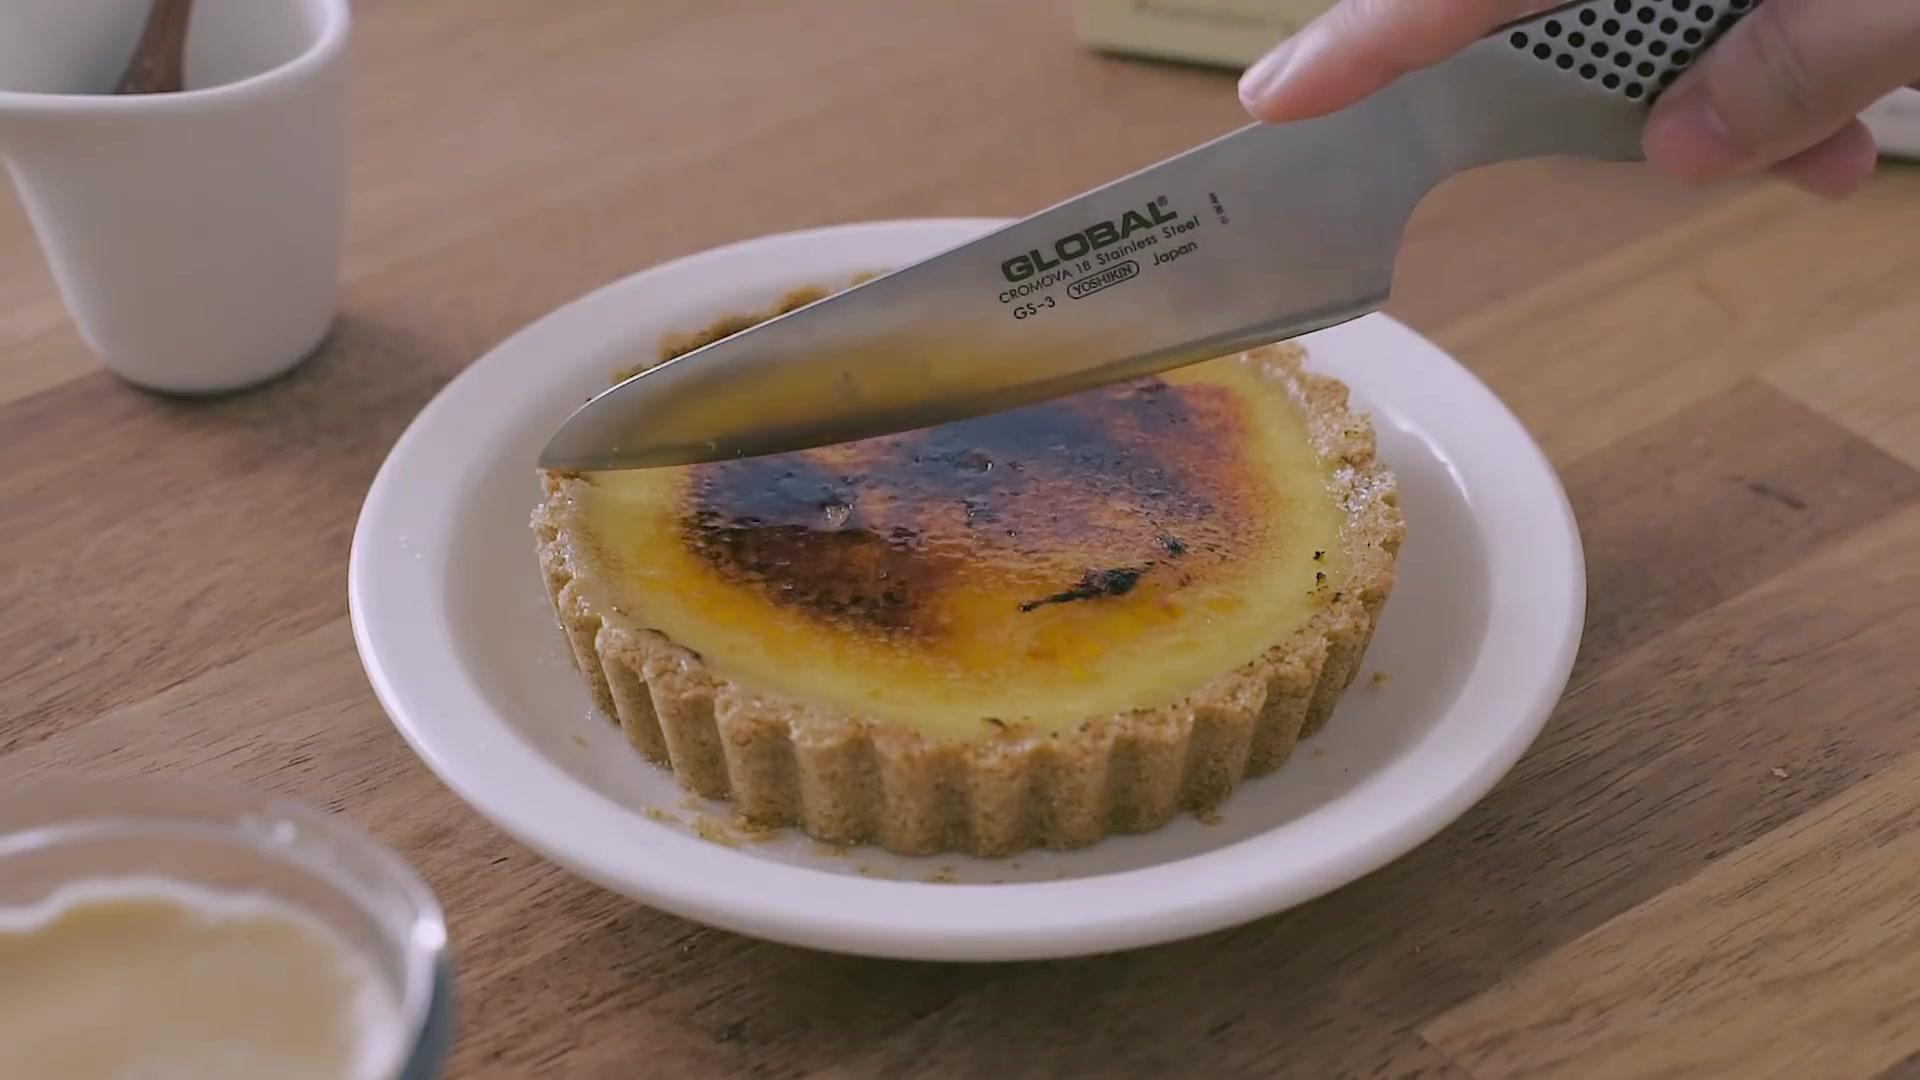 Honeykki Episode 215: Crème Brûlée Tart [Honeykki]